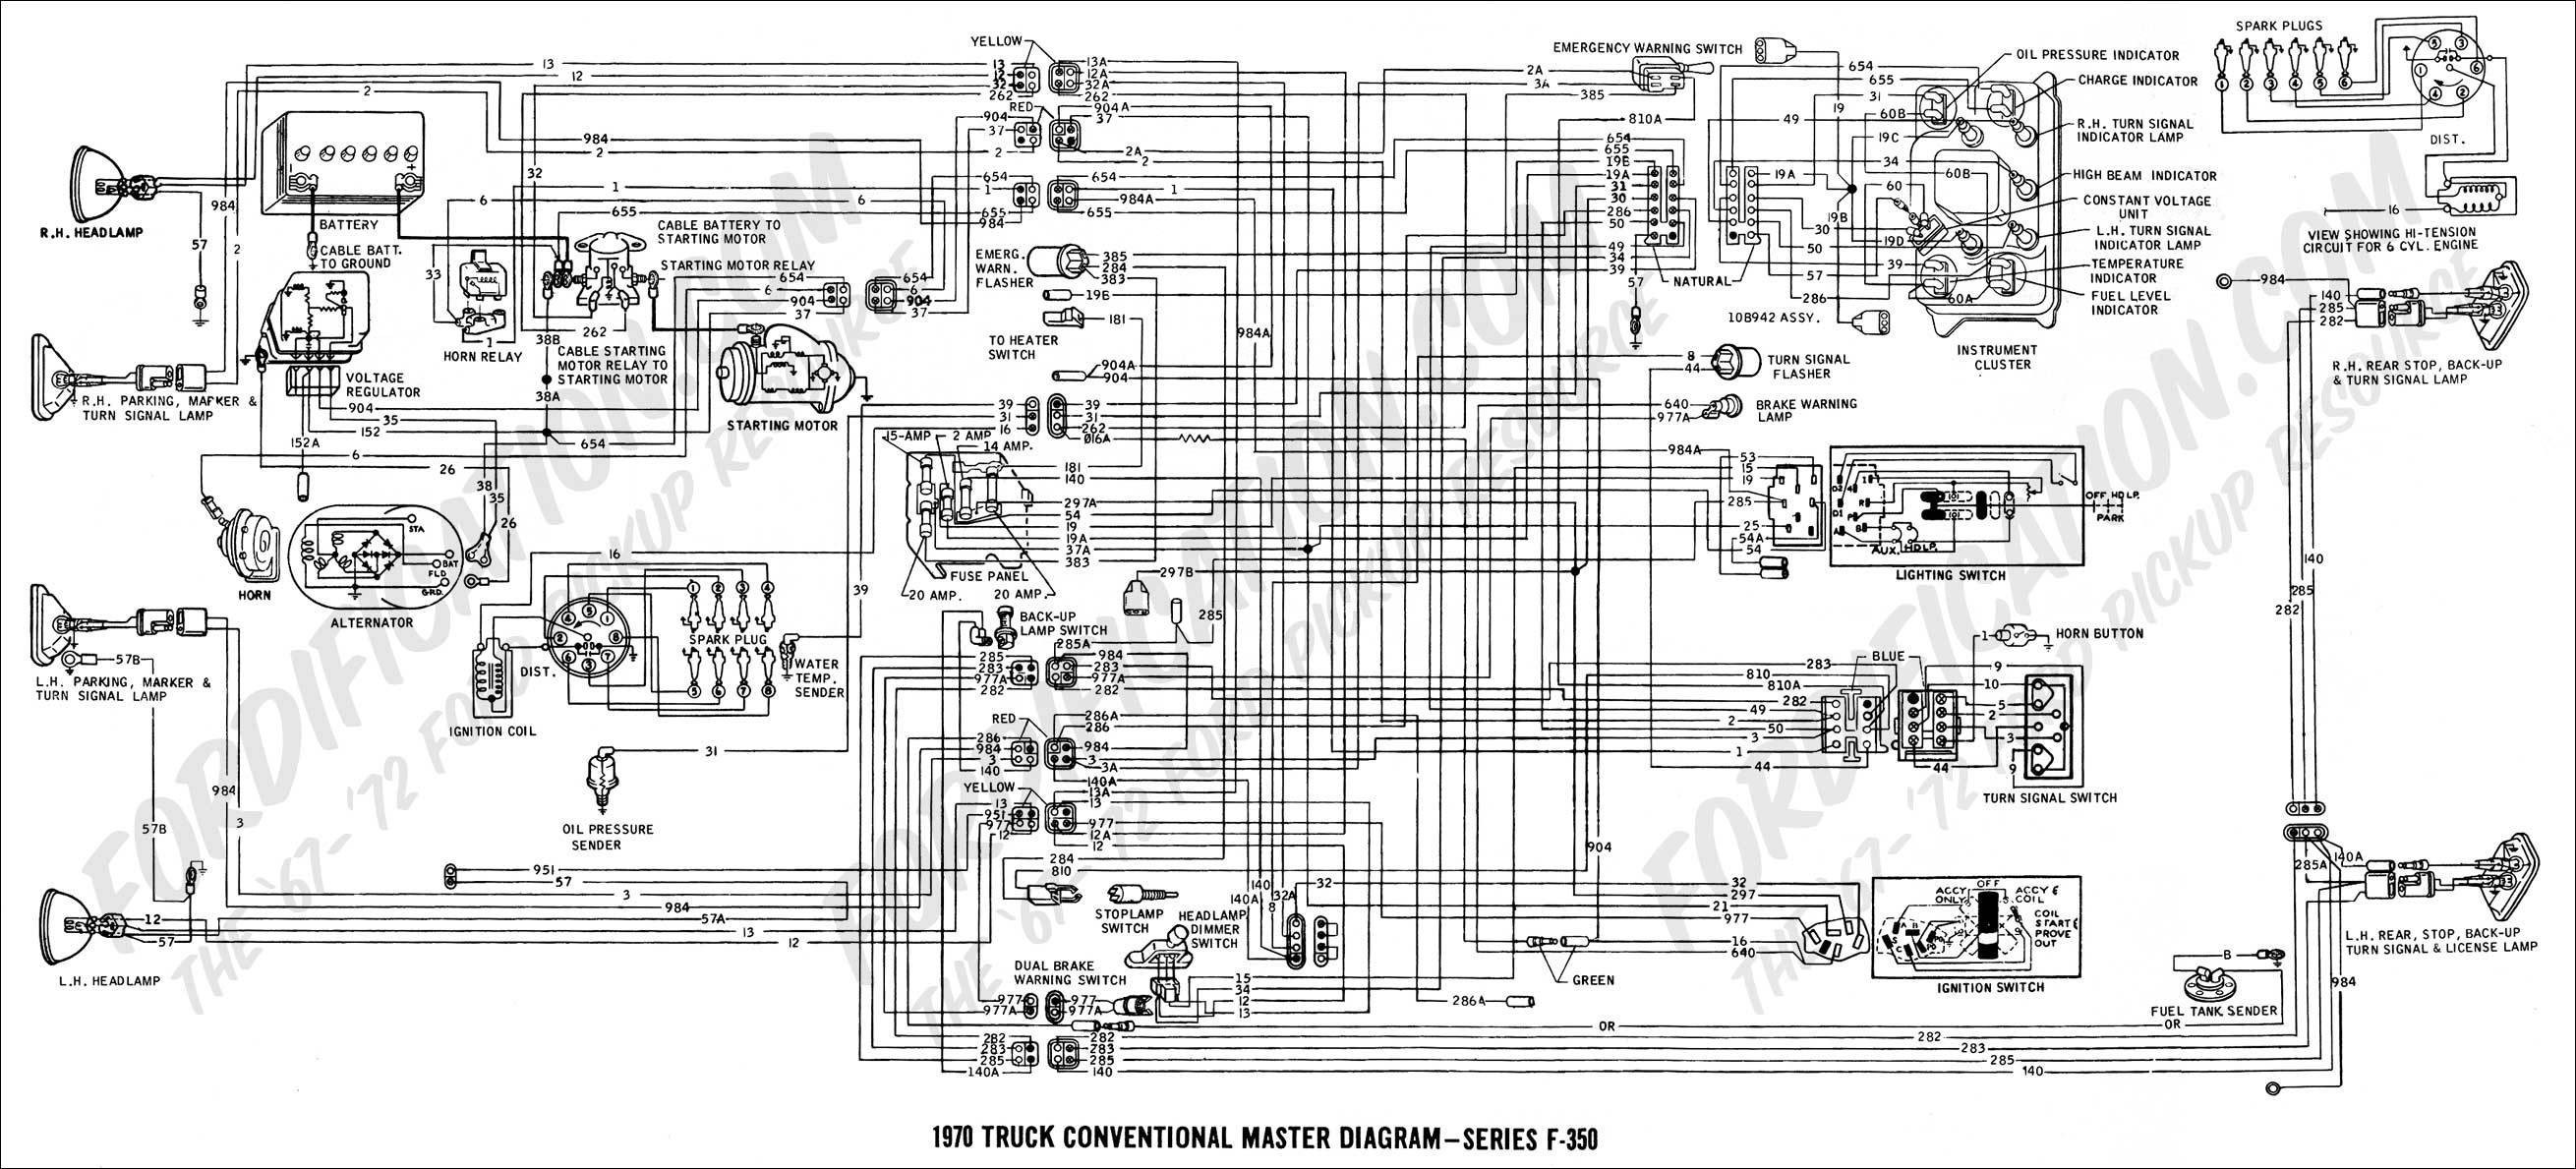 94 ford Ranger Engine Diagram 94 ford F350 Wiring Diagram Wiring Diagram Pass Of 94 ford Ranger Engine Diagram ford 3 0 Engine Diagrams Wiring Diagram Pass